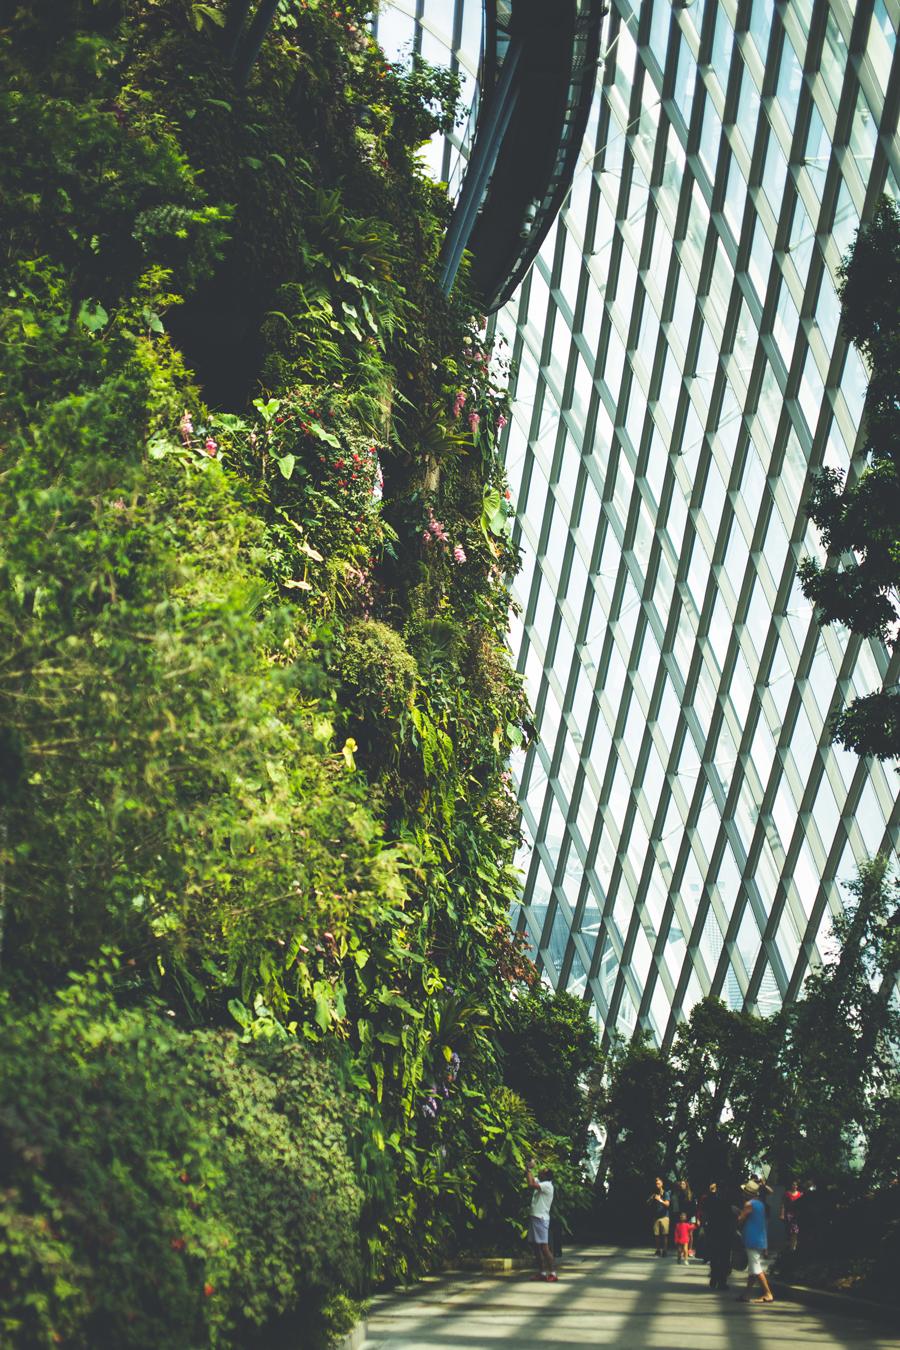 Singapore-150324-153